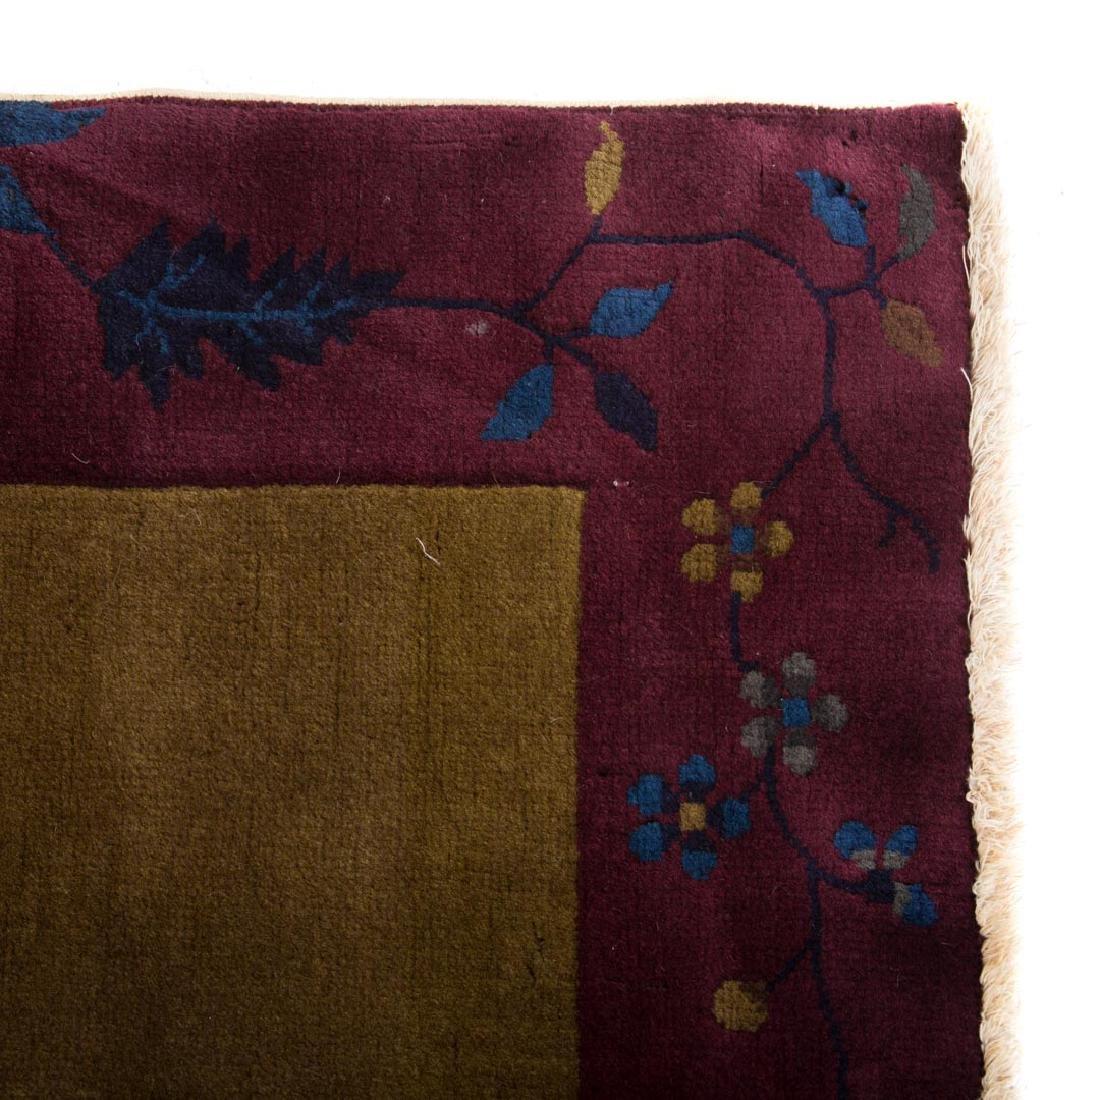 Antique Fette rug, approx. 4 x 6 - 2